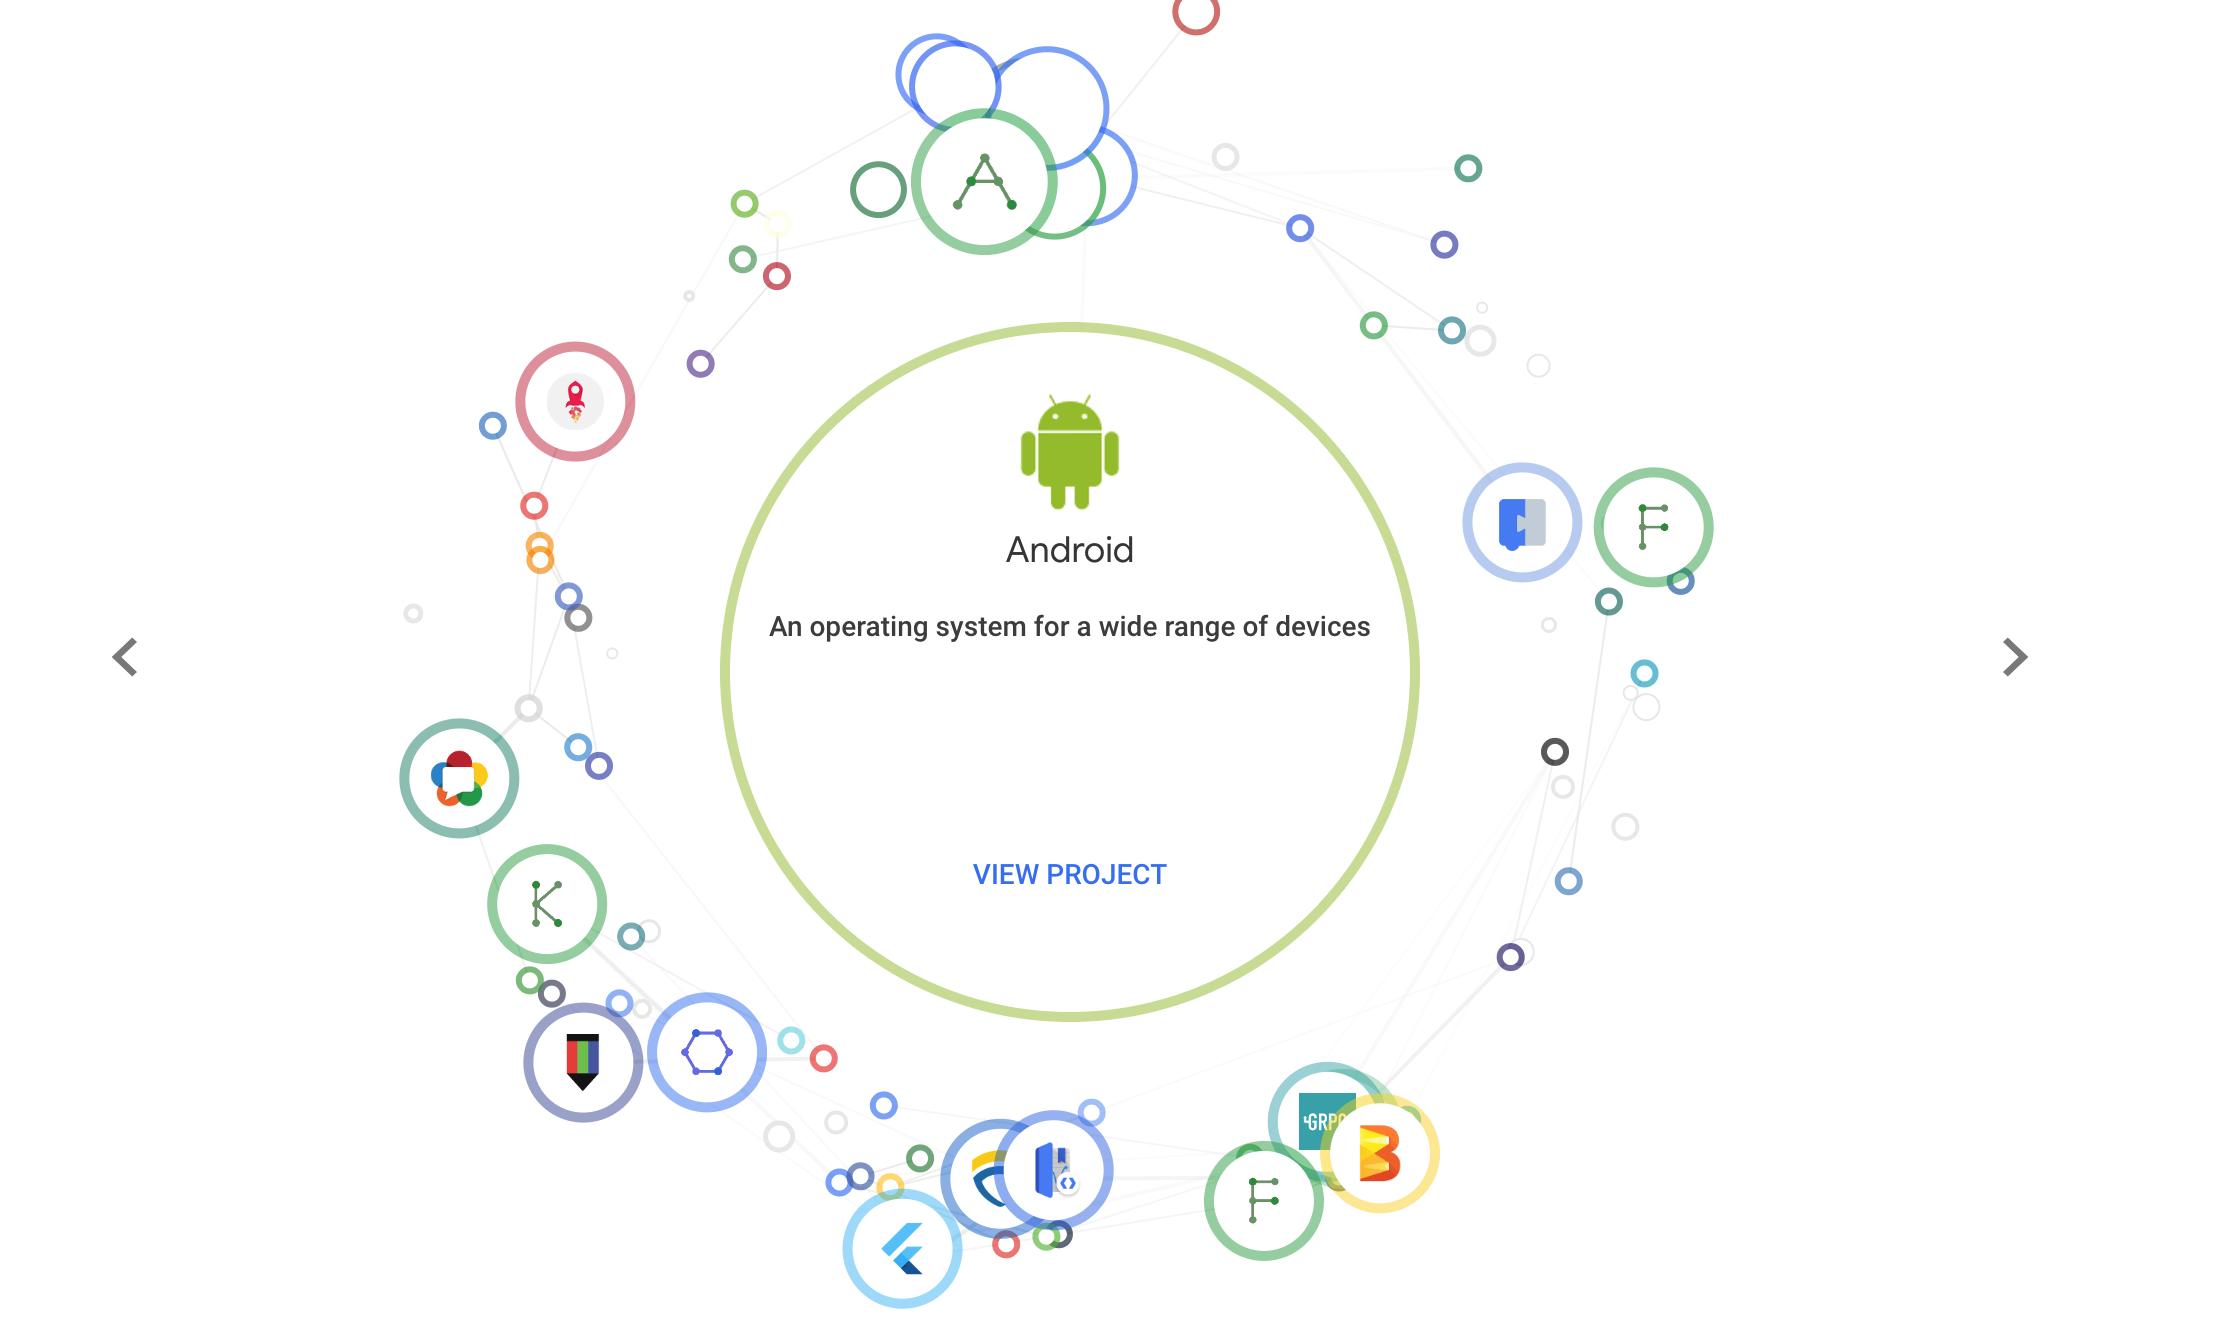 Google开源项目有两千个之多 来源:opensource.google